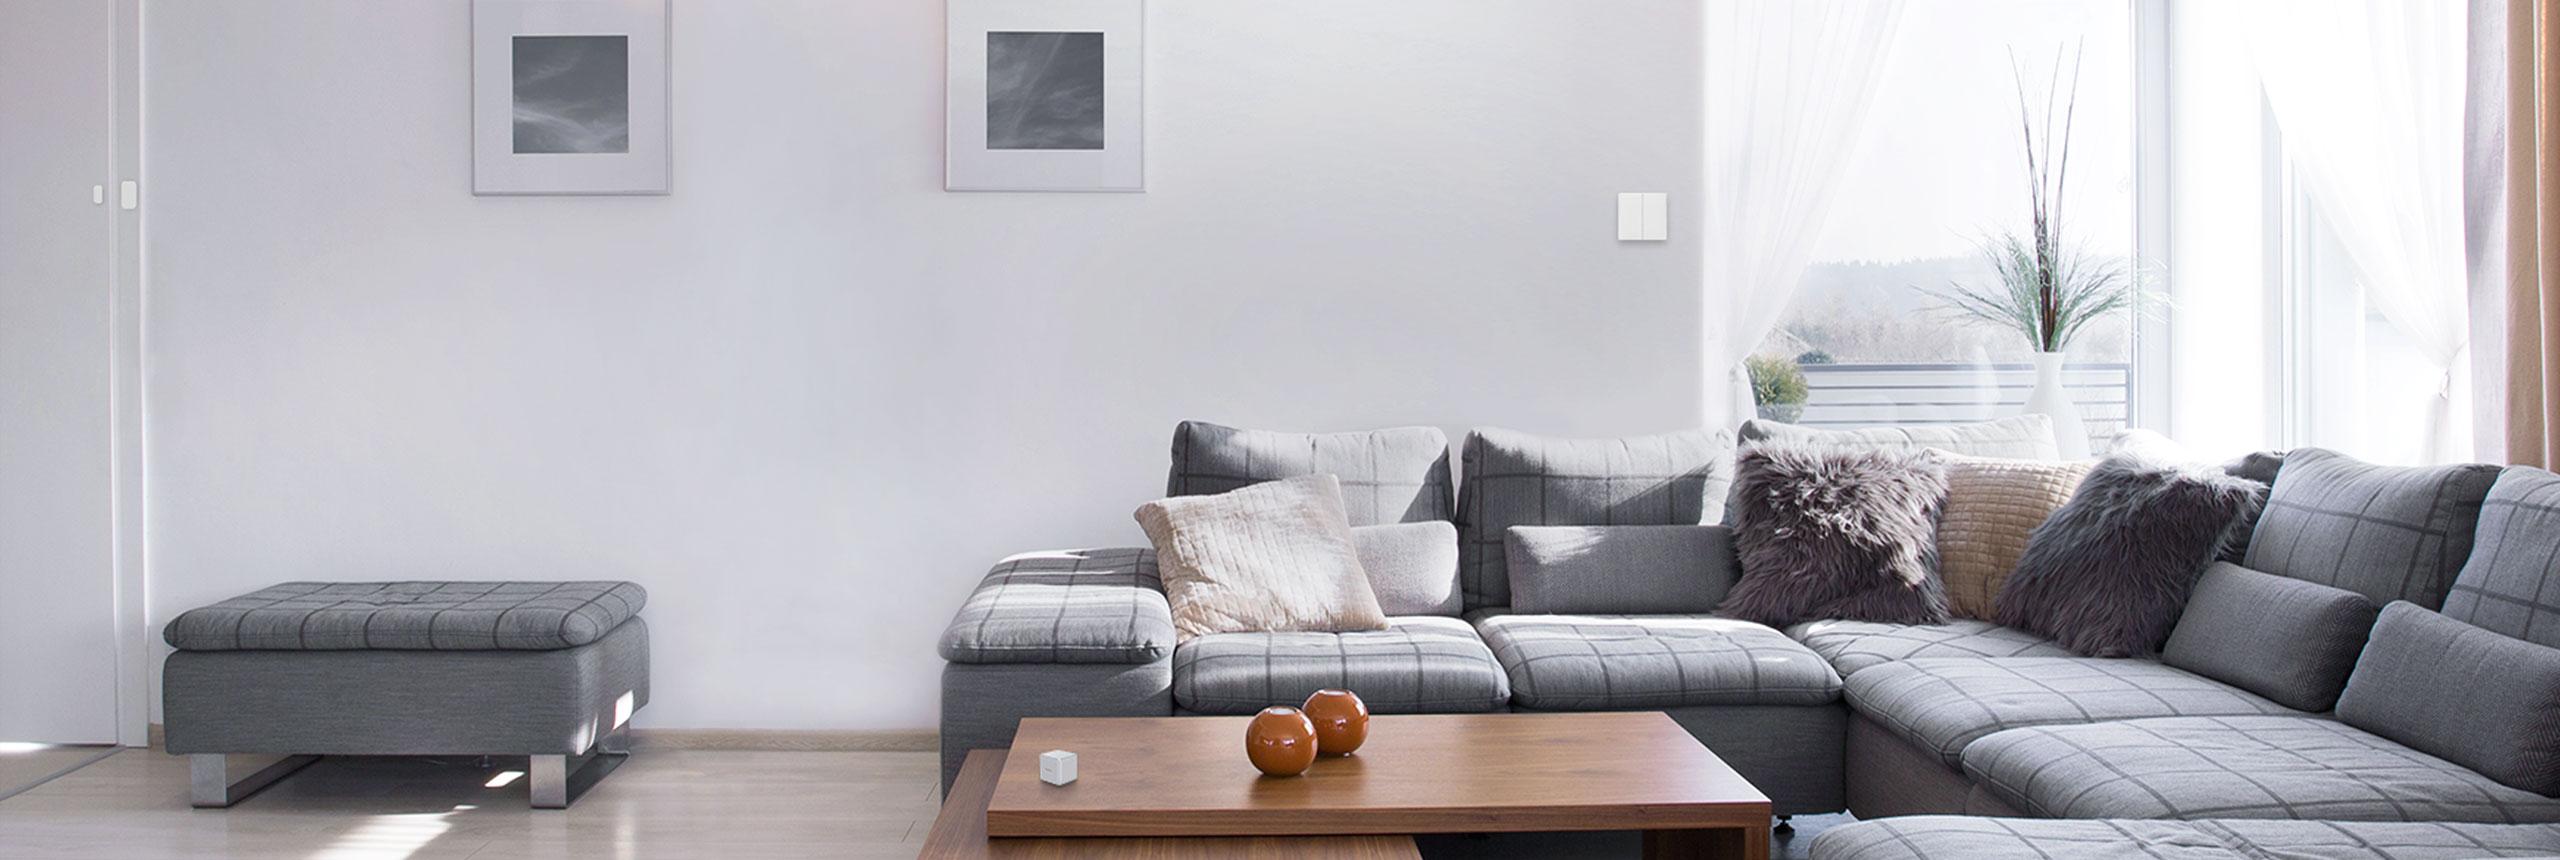 Aqara smart home automation